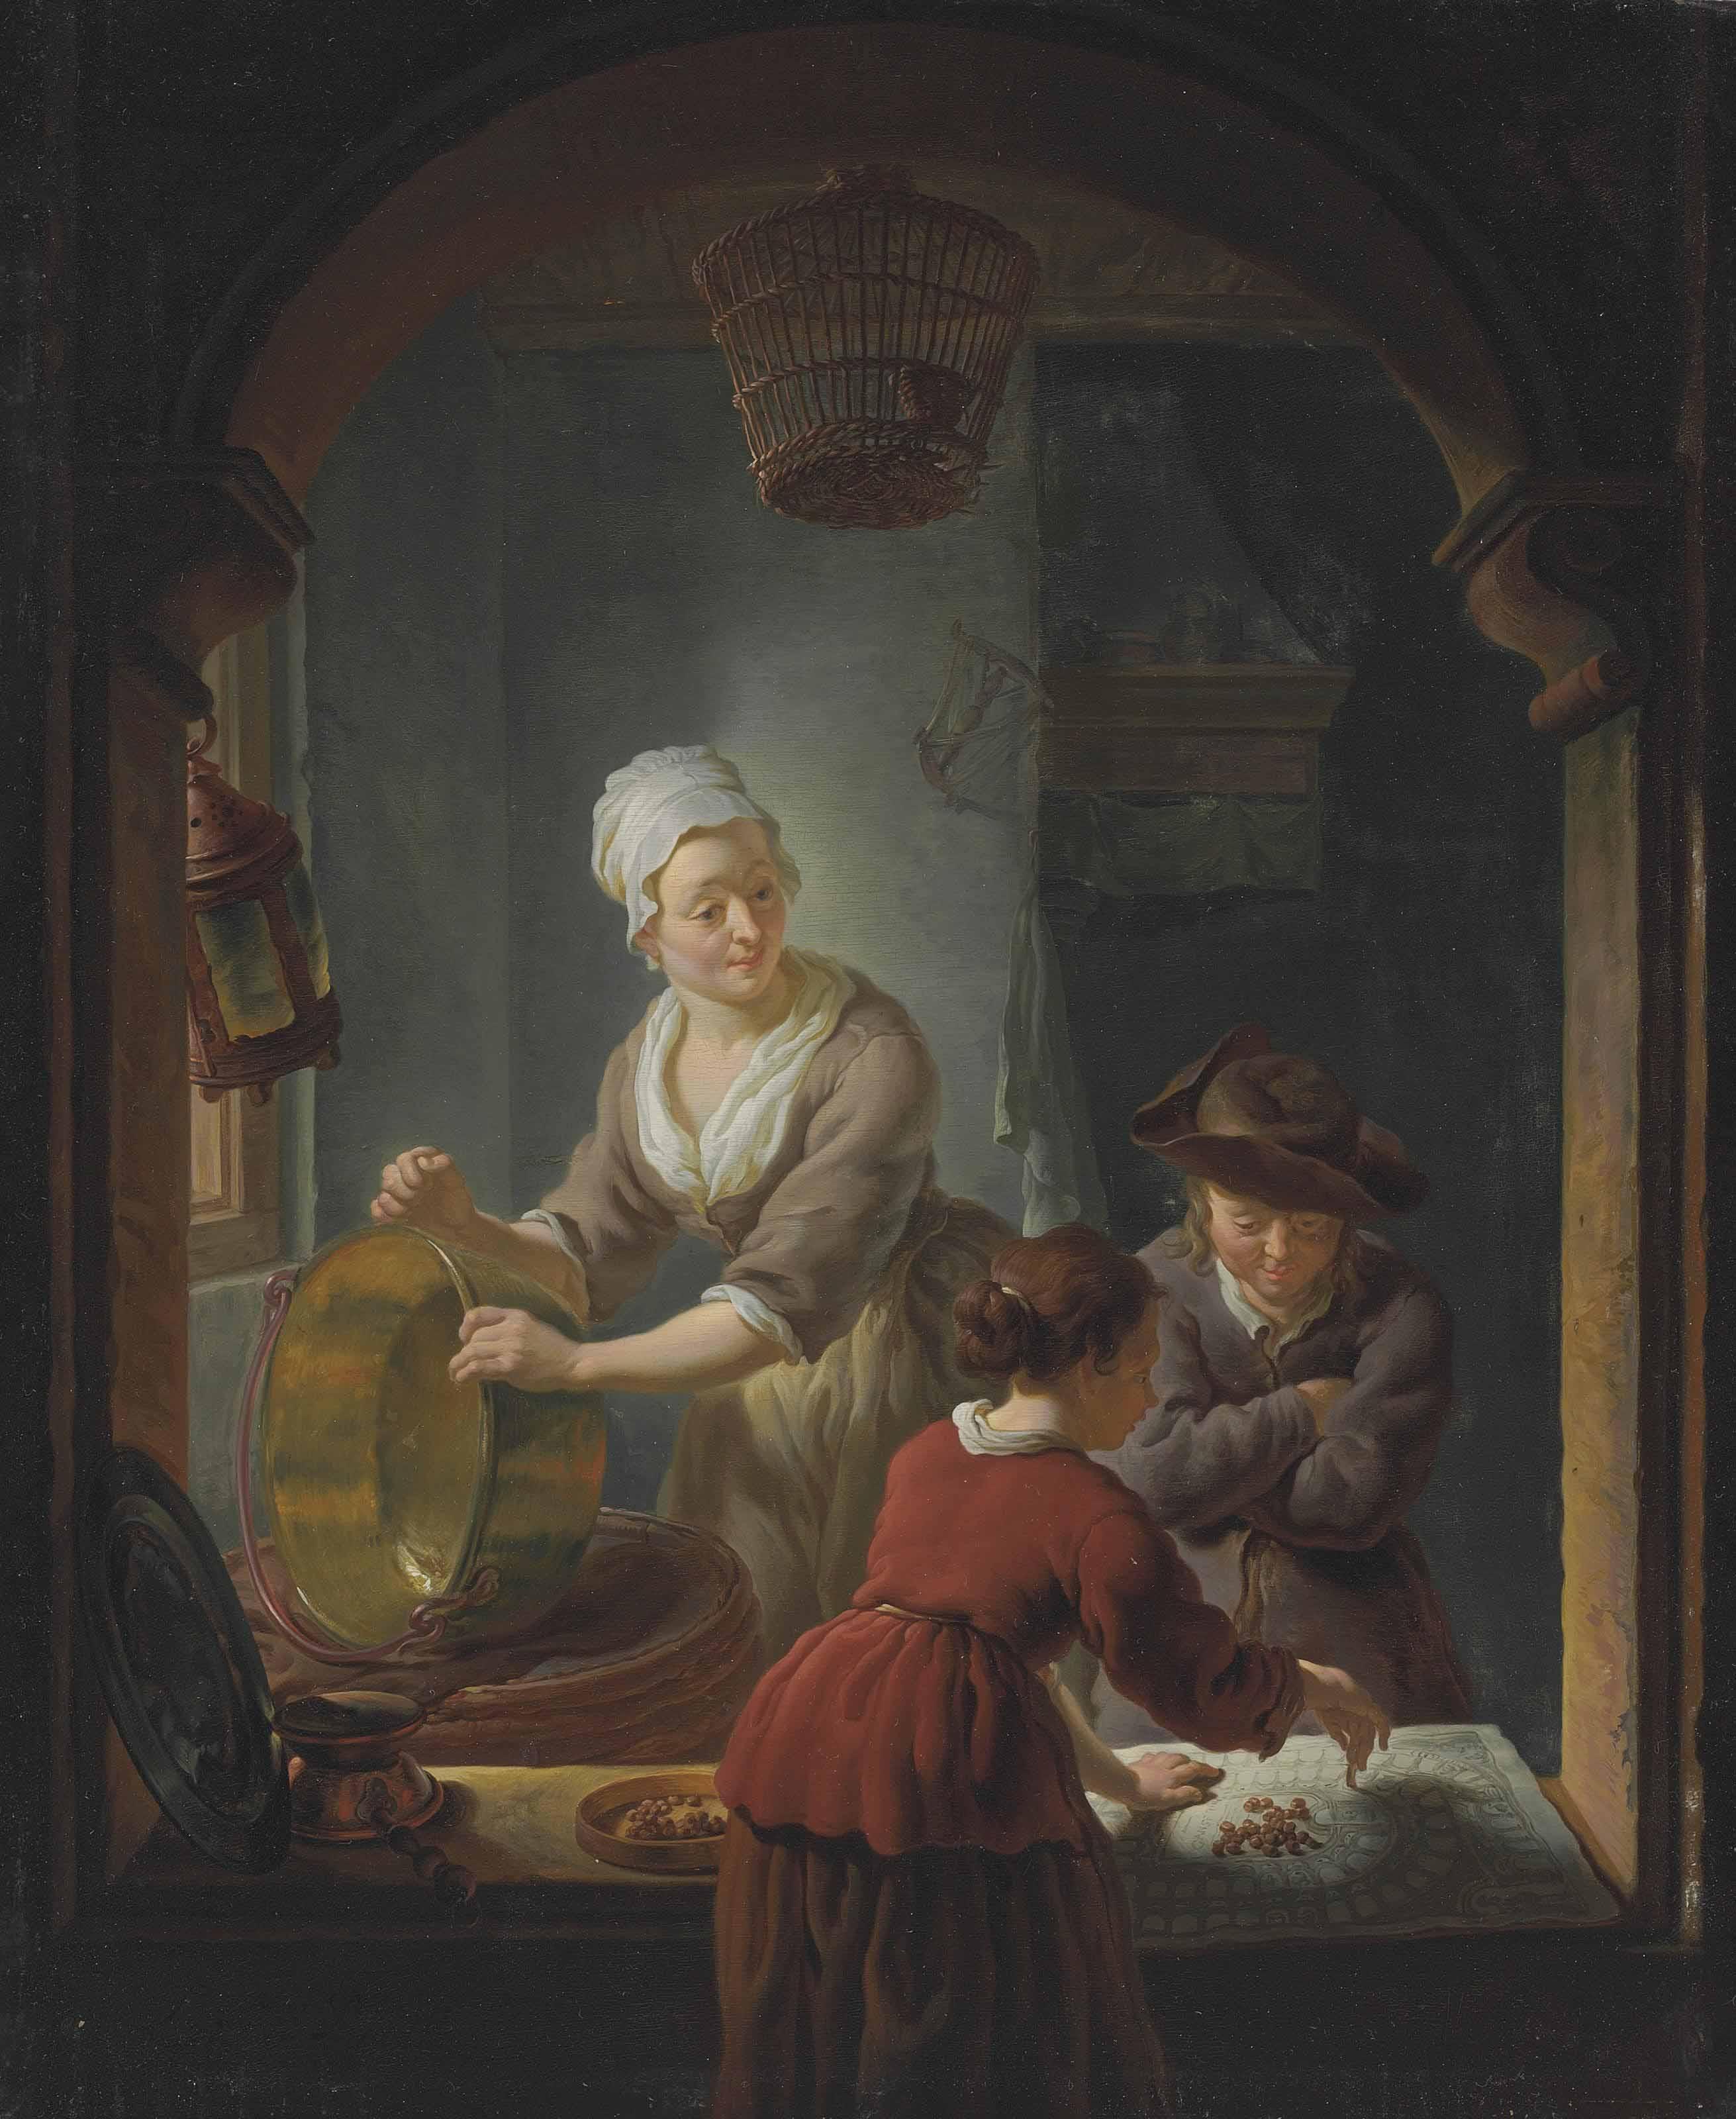 Kitchen Art Leiden.Louis De Moni Breda 1698 1771 Leiden An Interior With A Kitchen